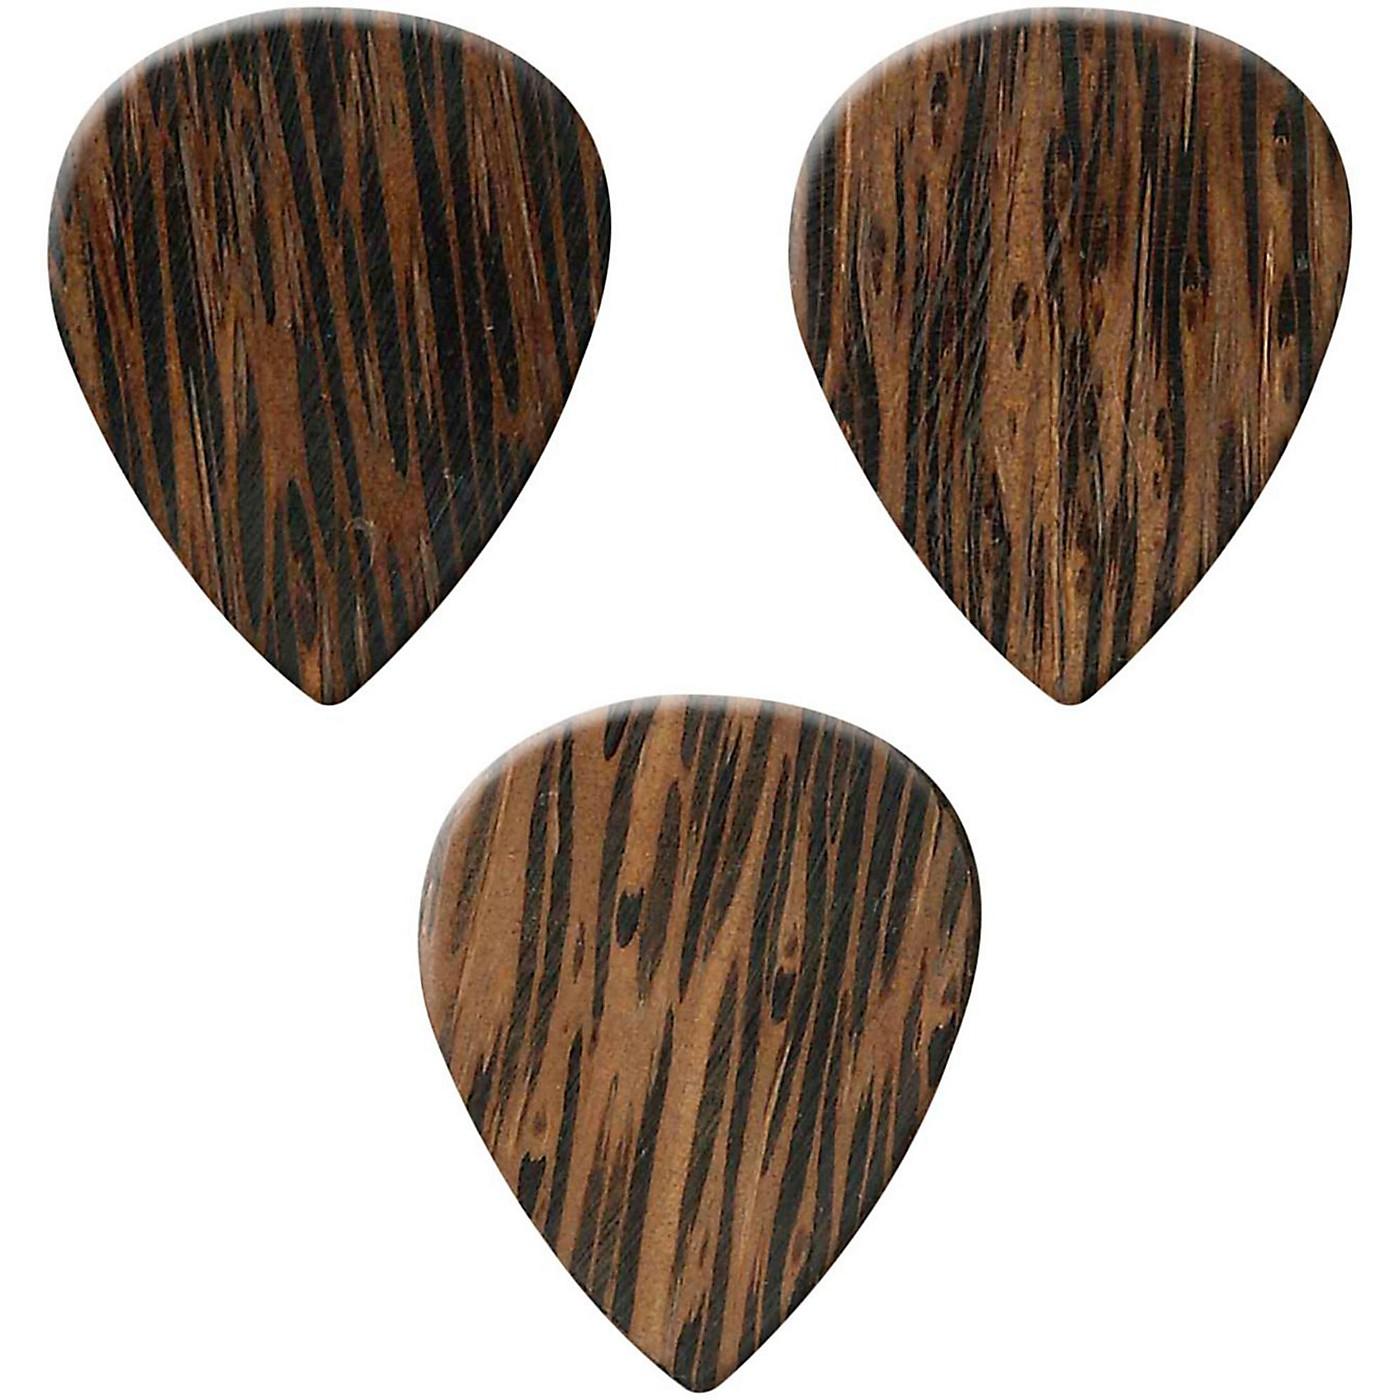 Clayton Exotic Wedge Wood Guitar Picks - 3 Pack thumbnail